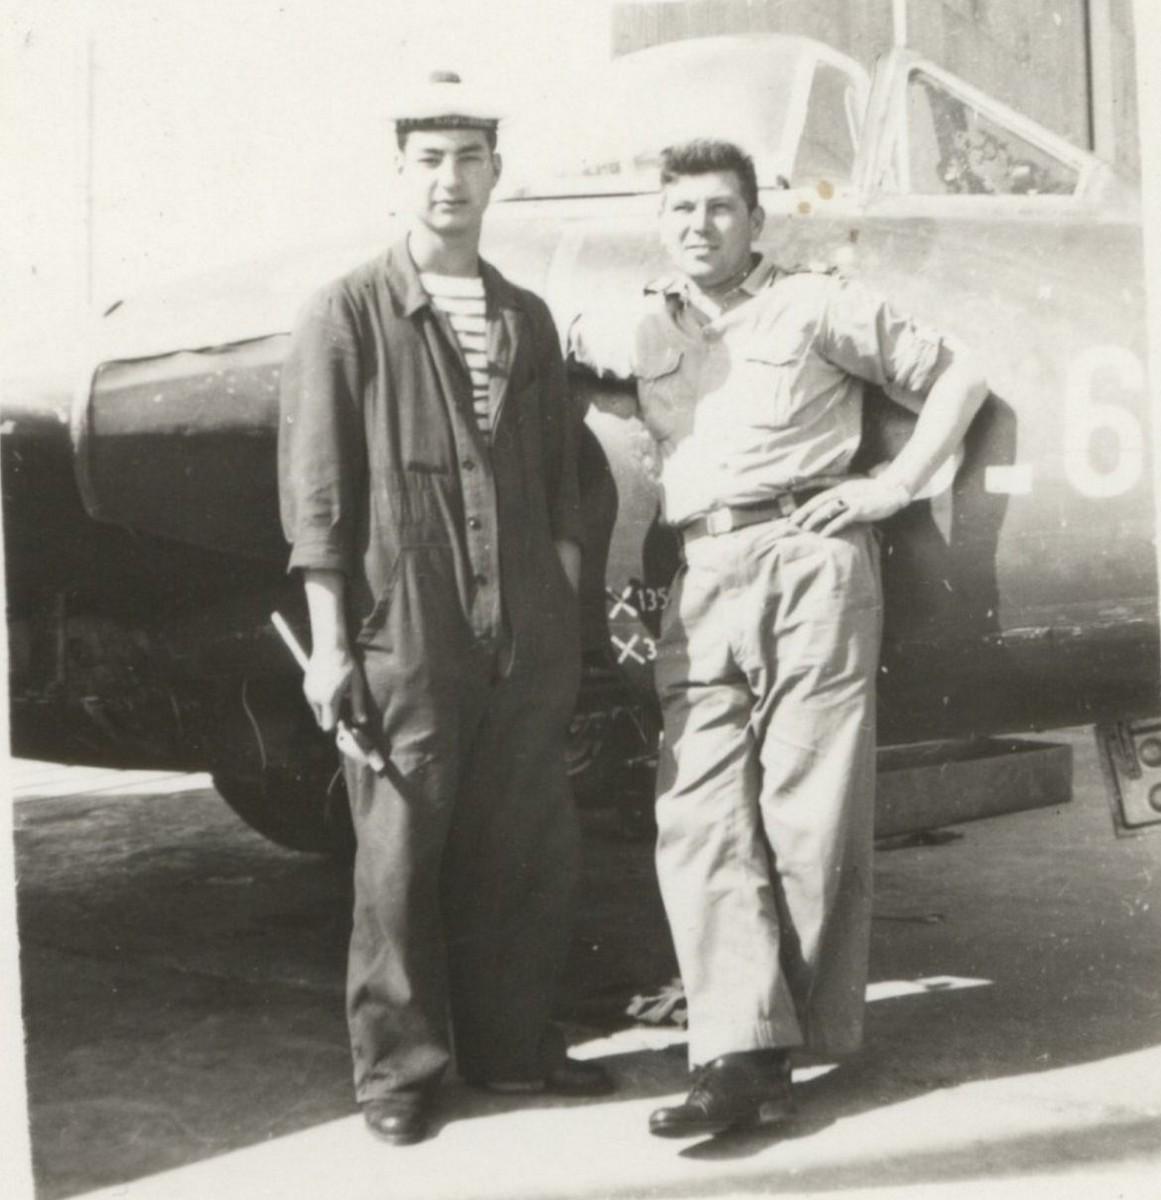 [LES B.A.N.] KHOURIBGA - MAROC 917